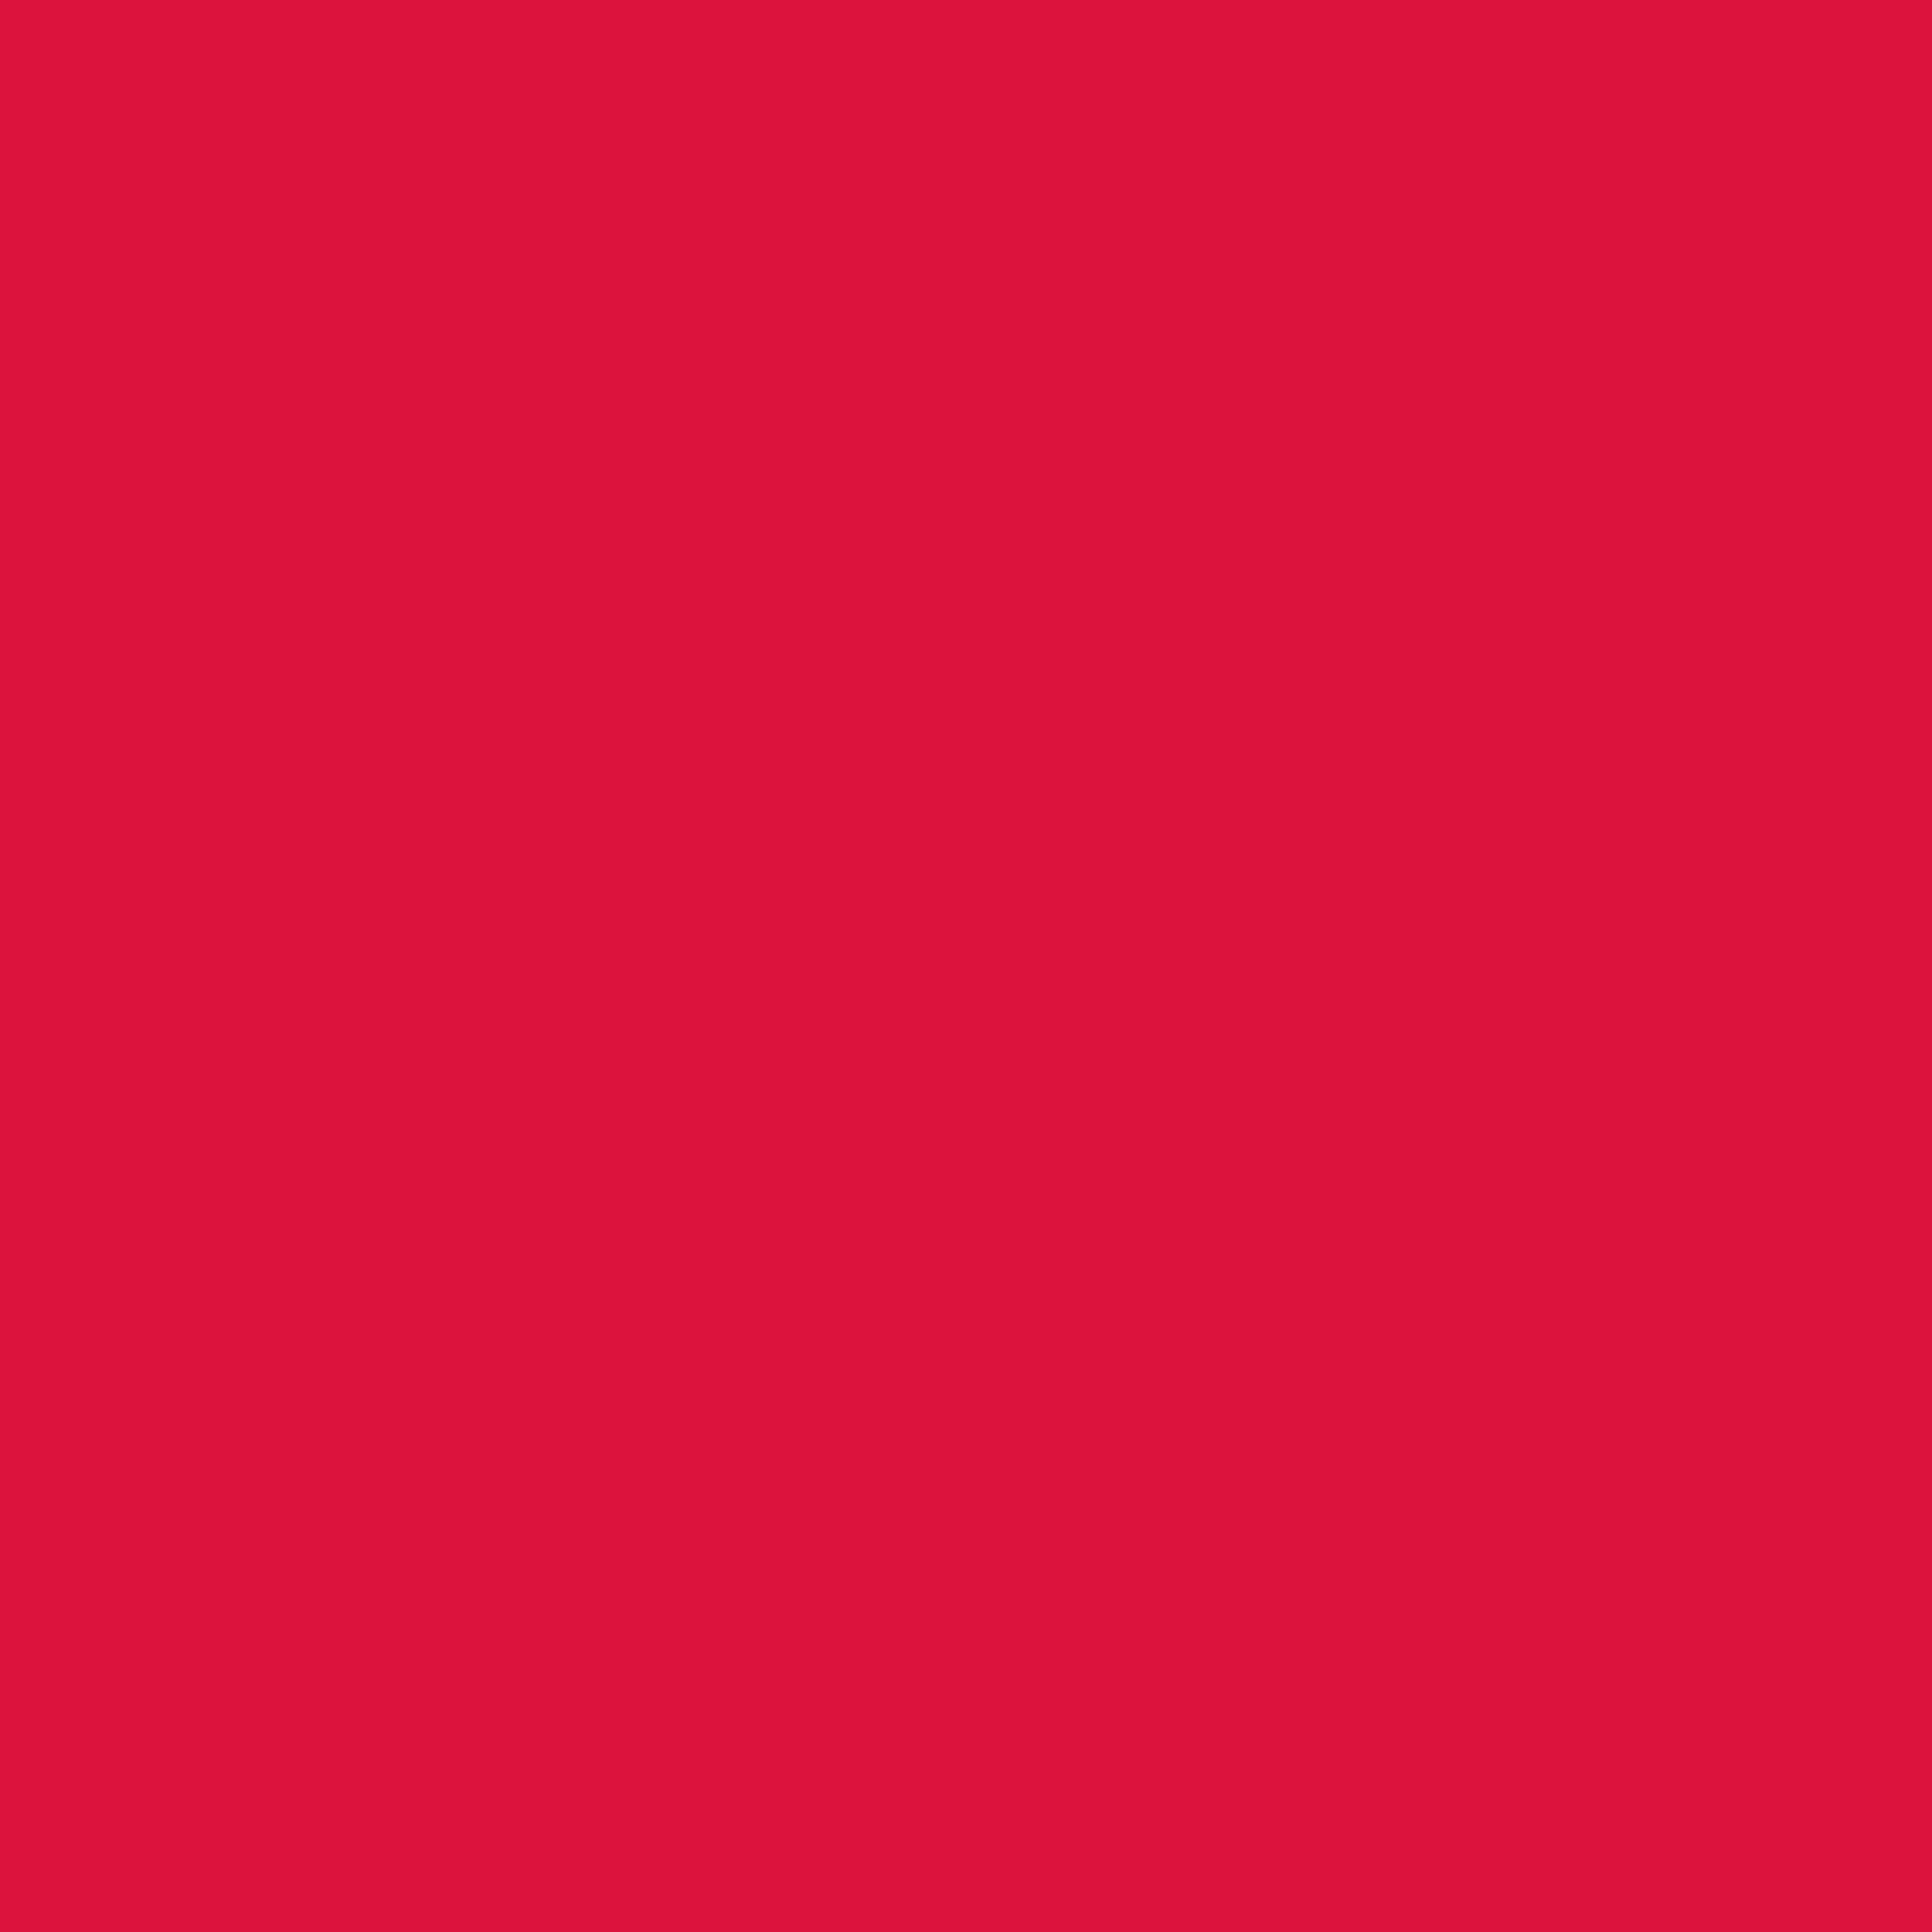 2048x2048 Crimson Solid Color Background